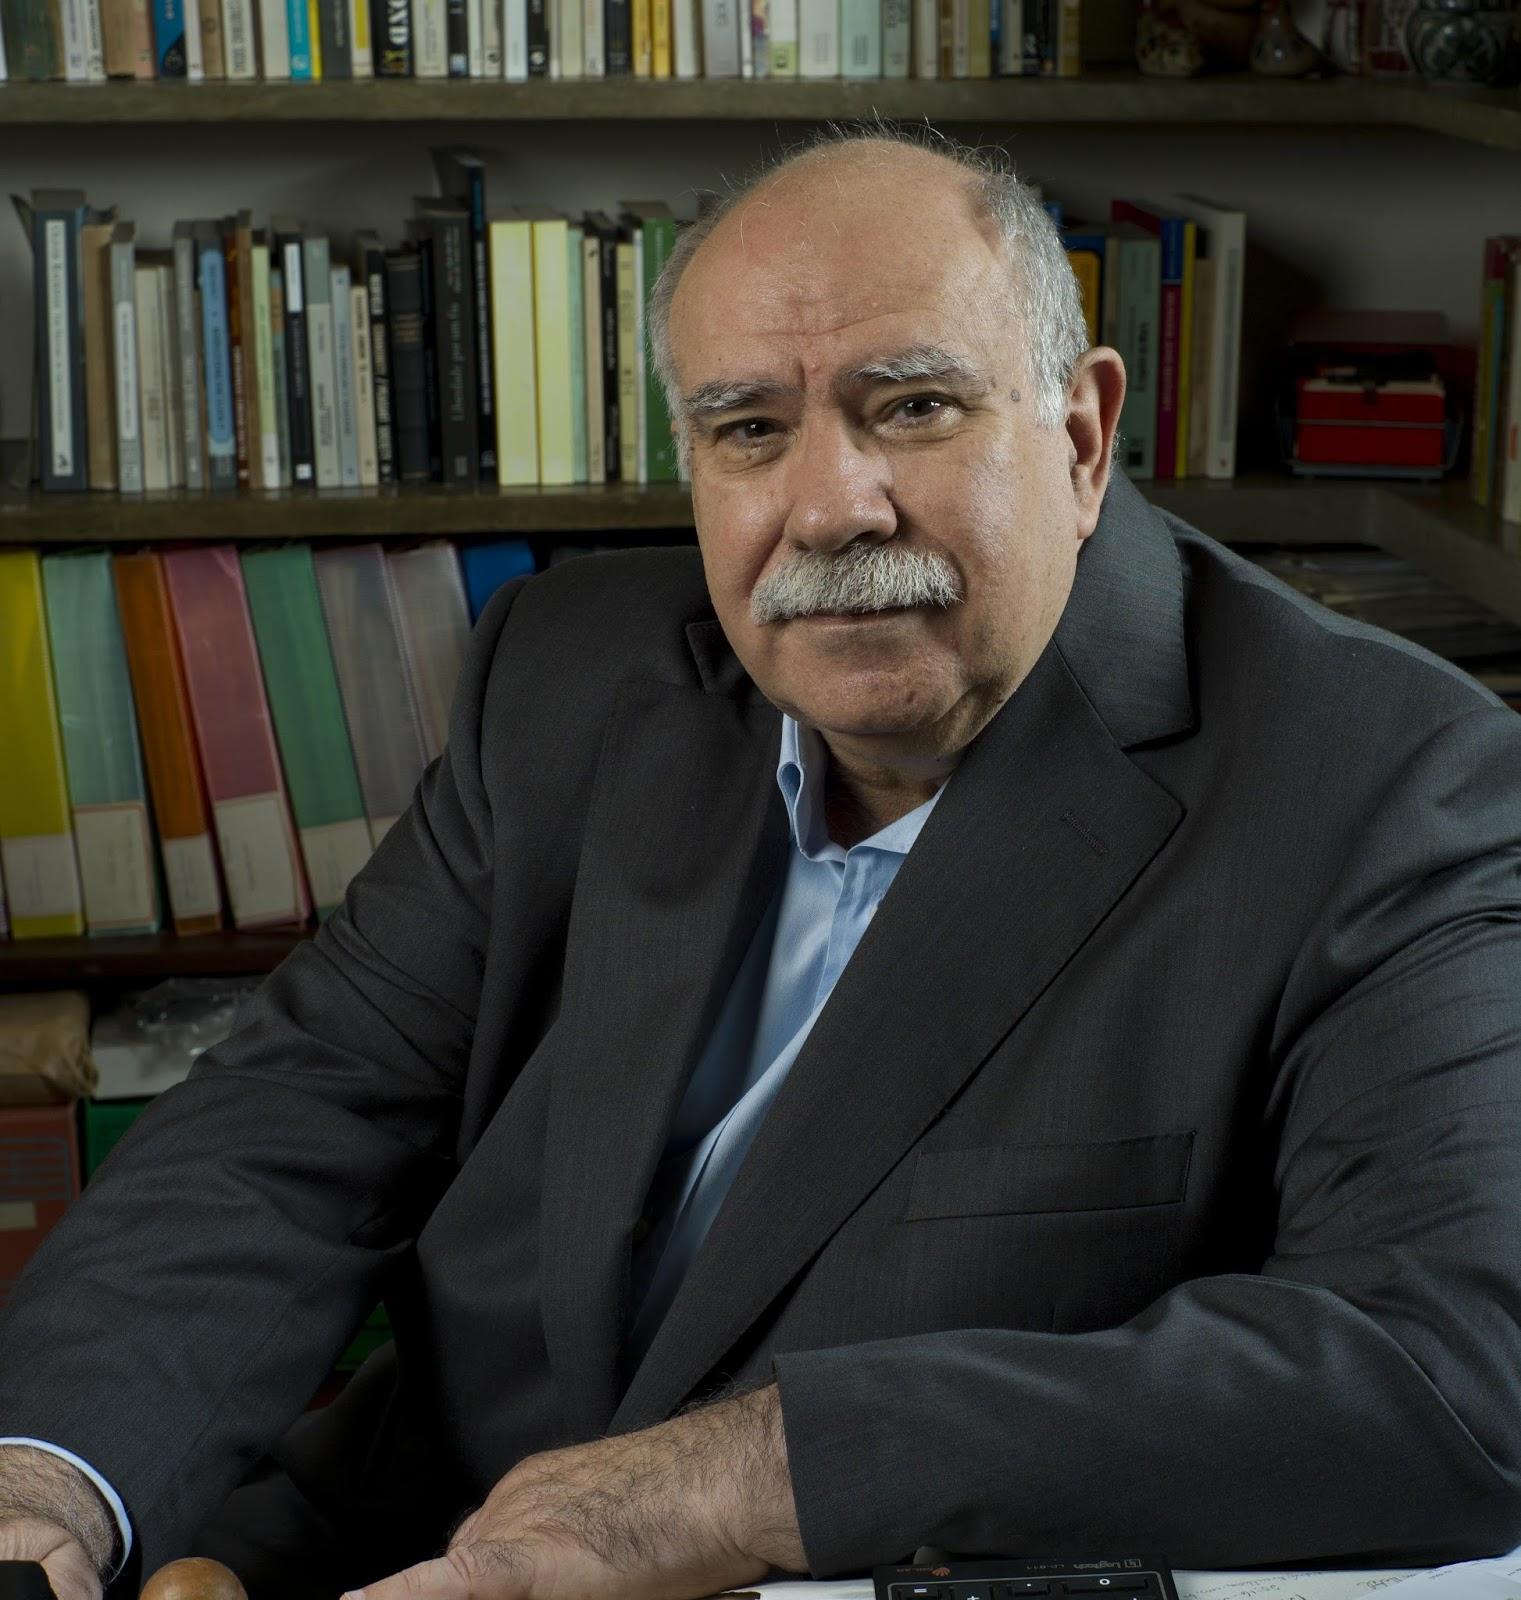 Resultado de imagem para José de Souza Martins - sociólog